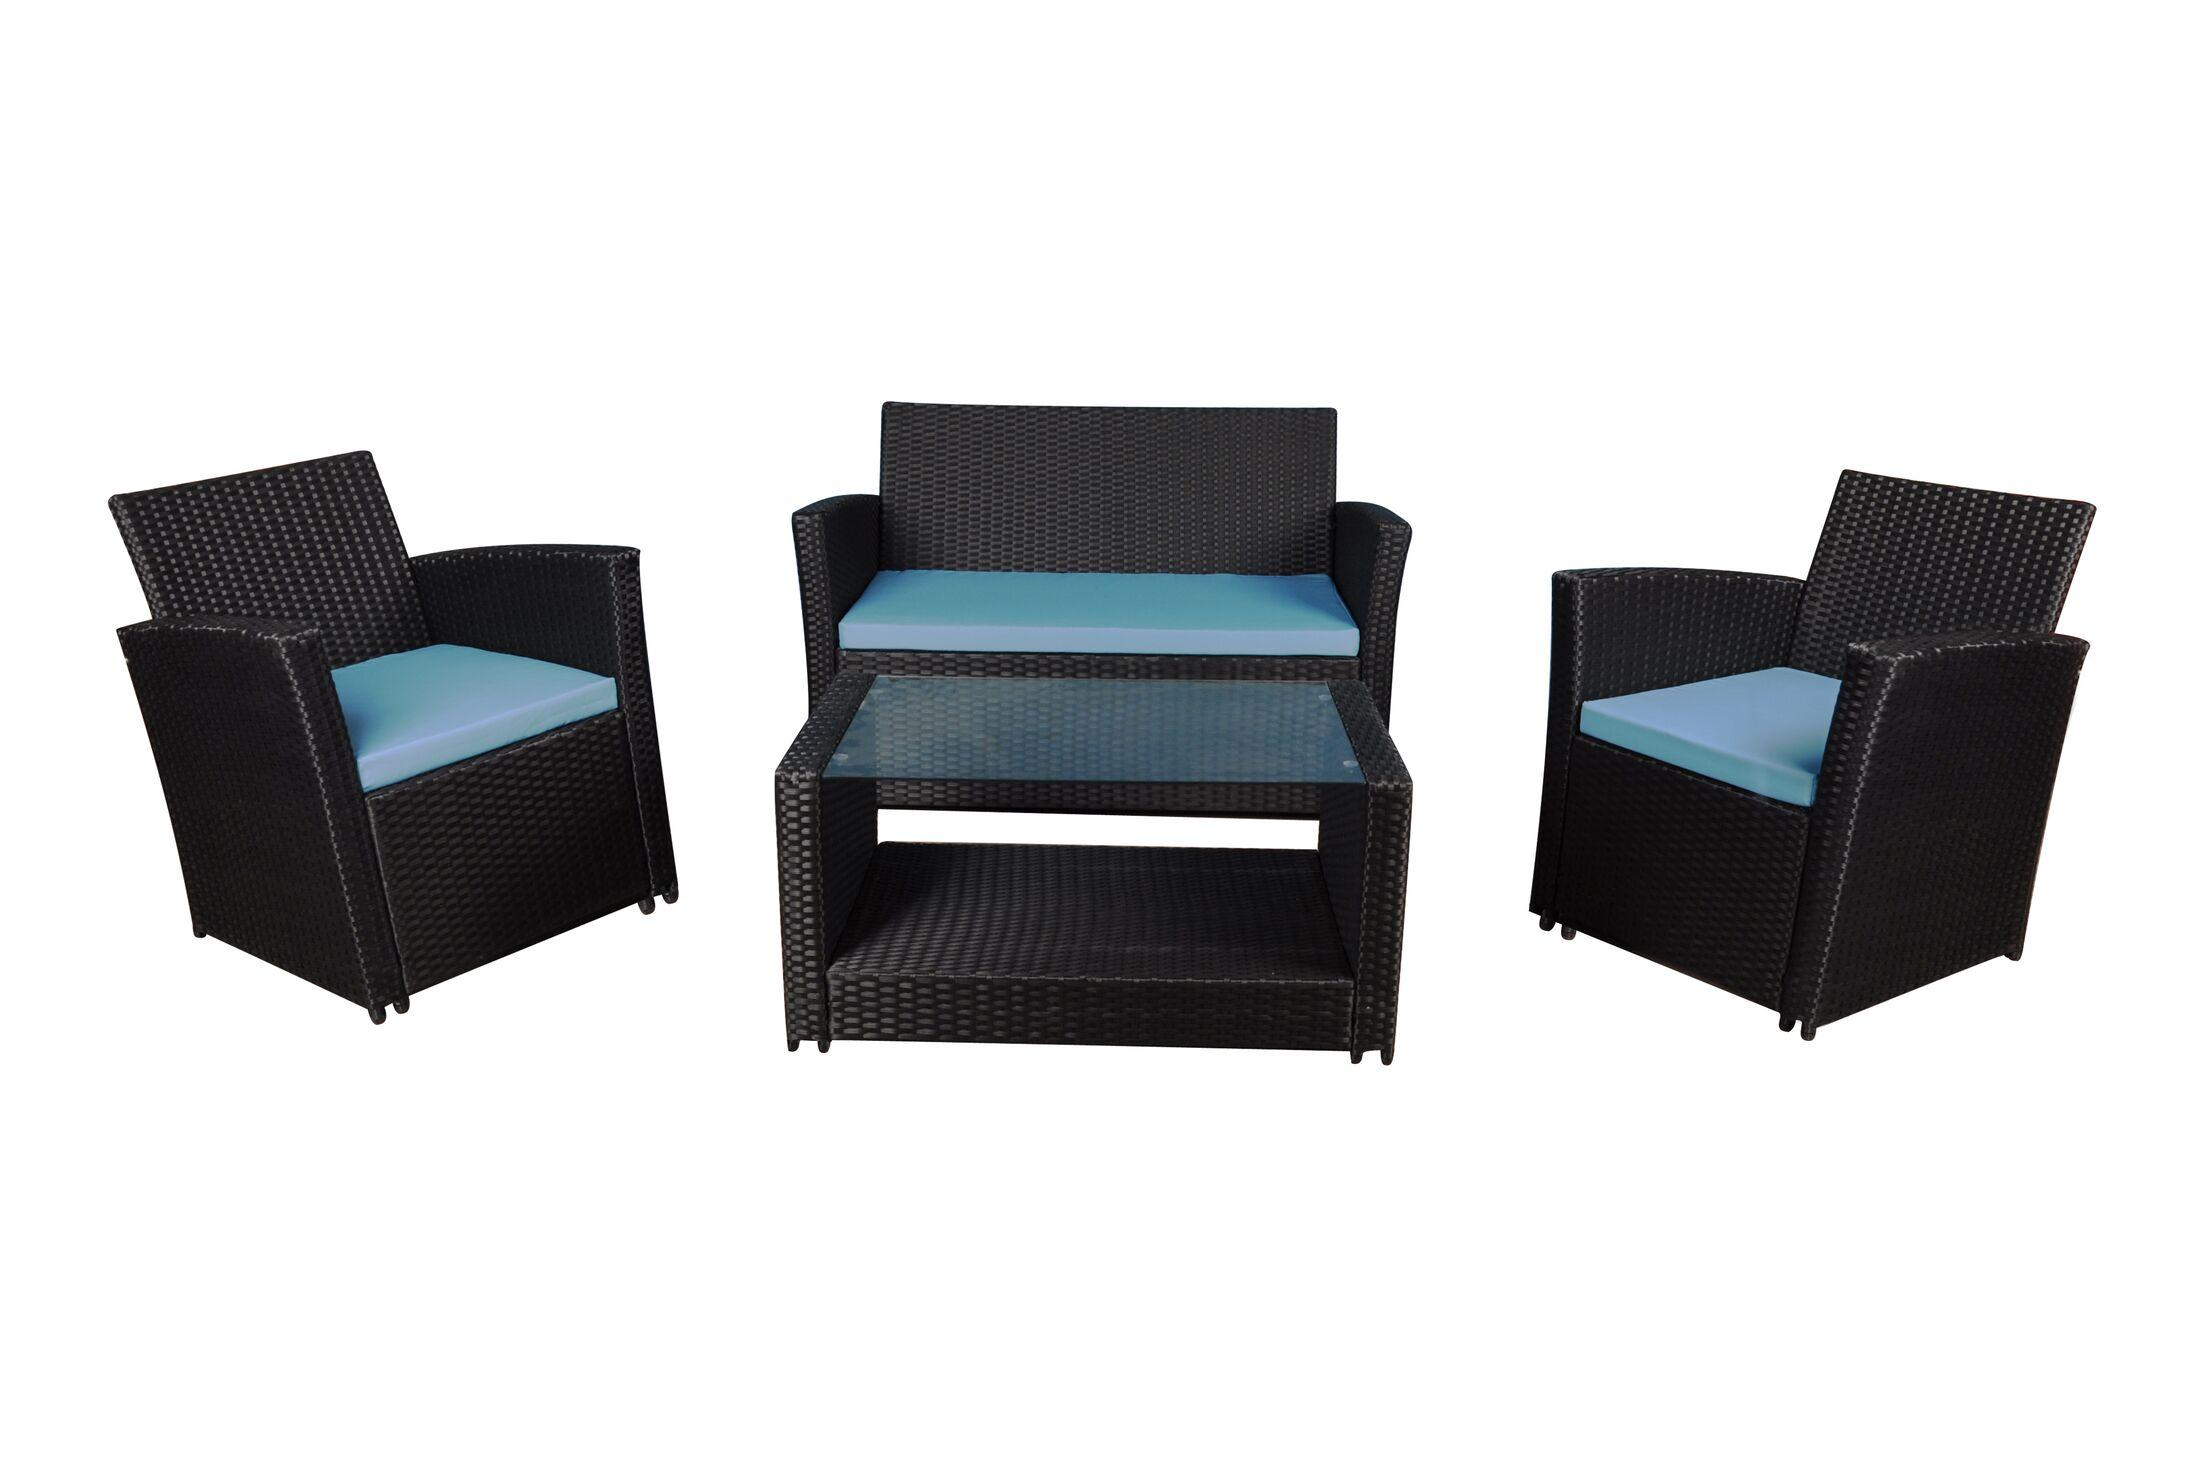 4 Piece Sofa Set with Cushions Frame Color: Black, Fabric: Blue